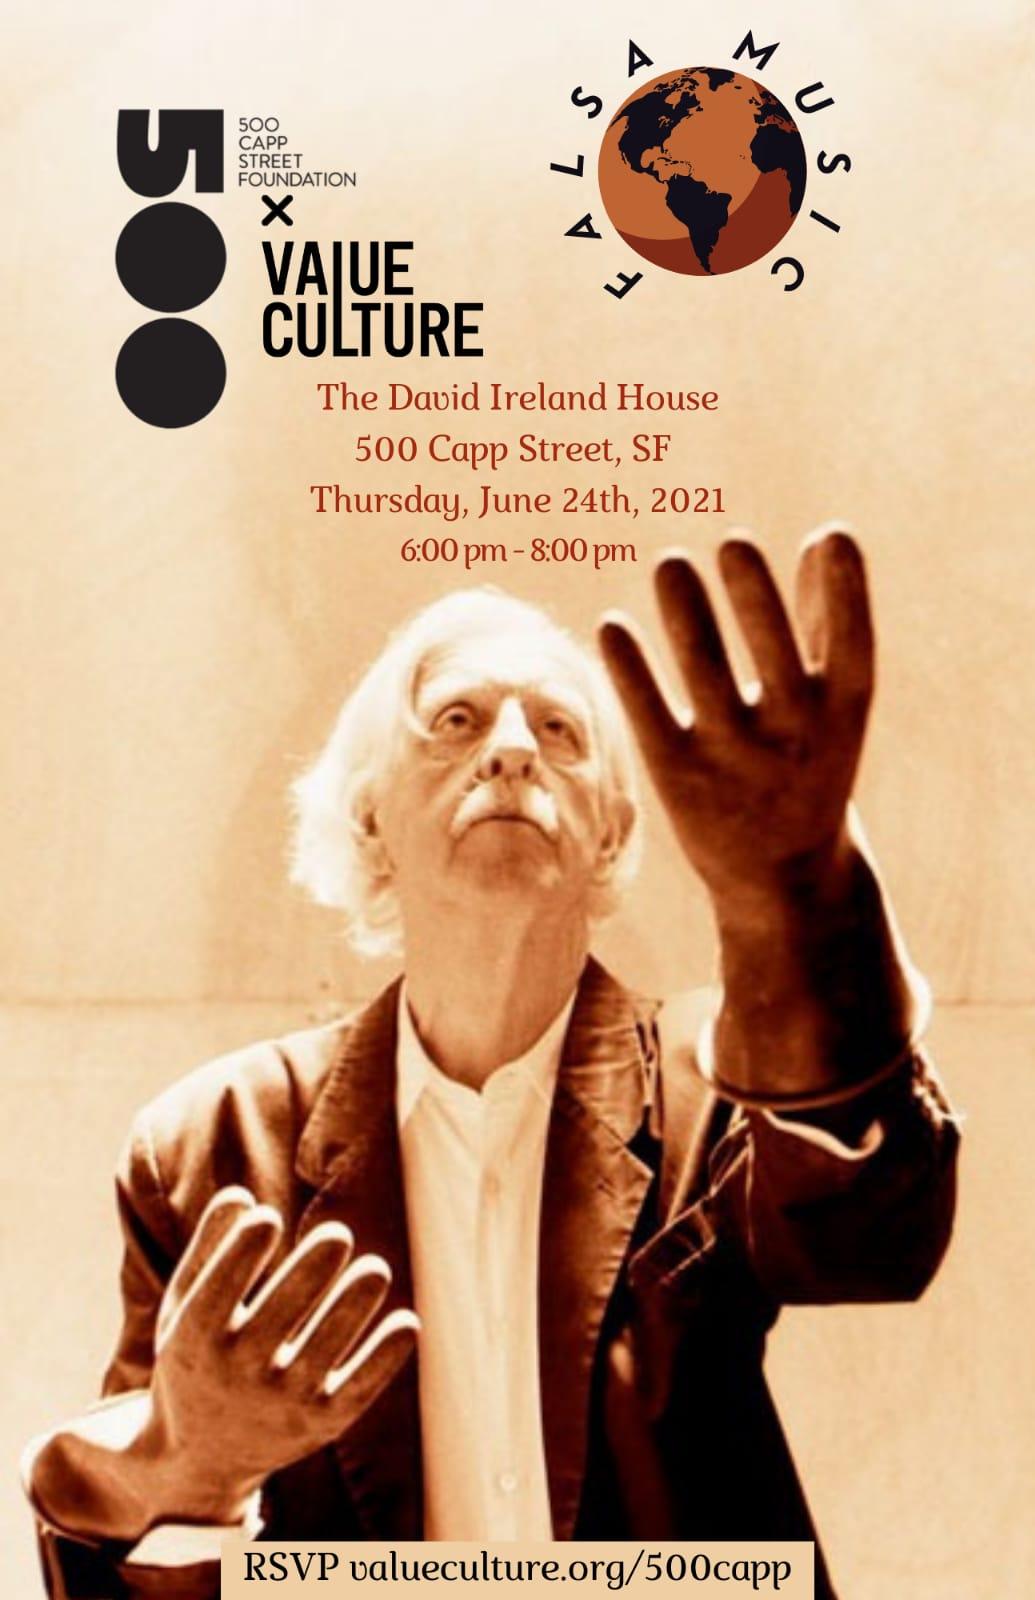 Value Culture x The David Ireland House